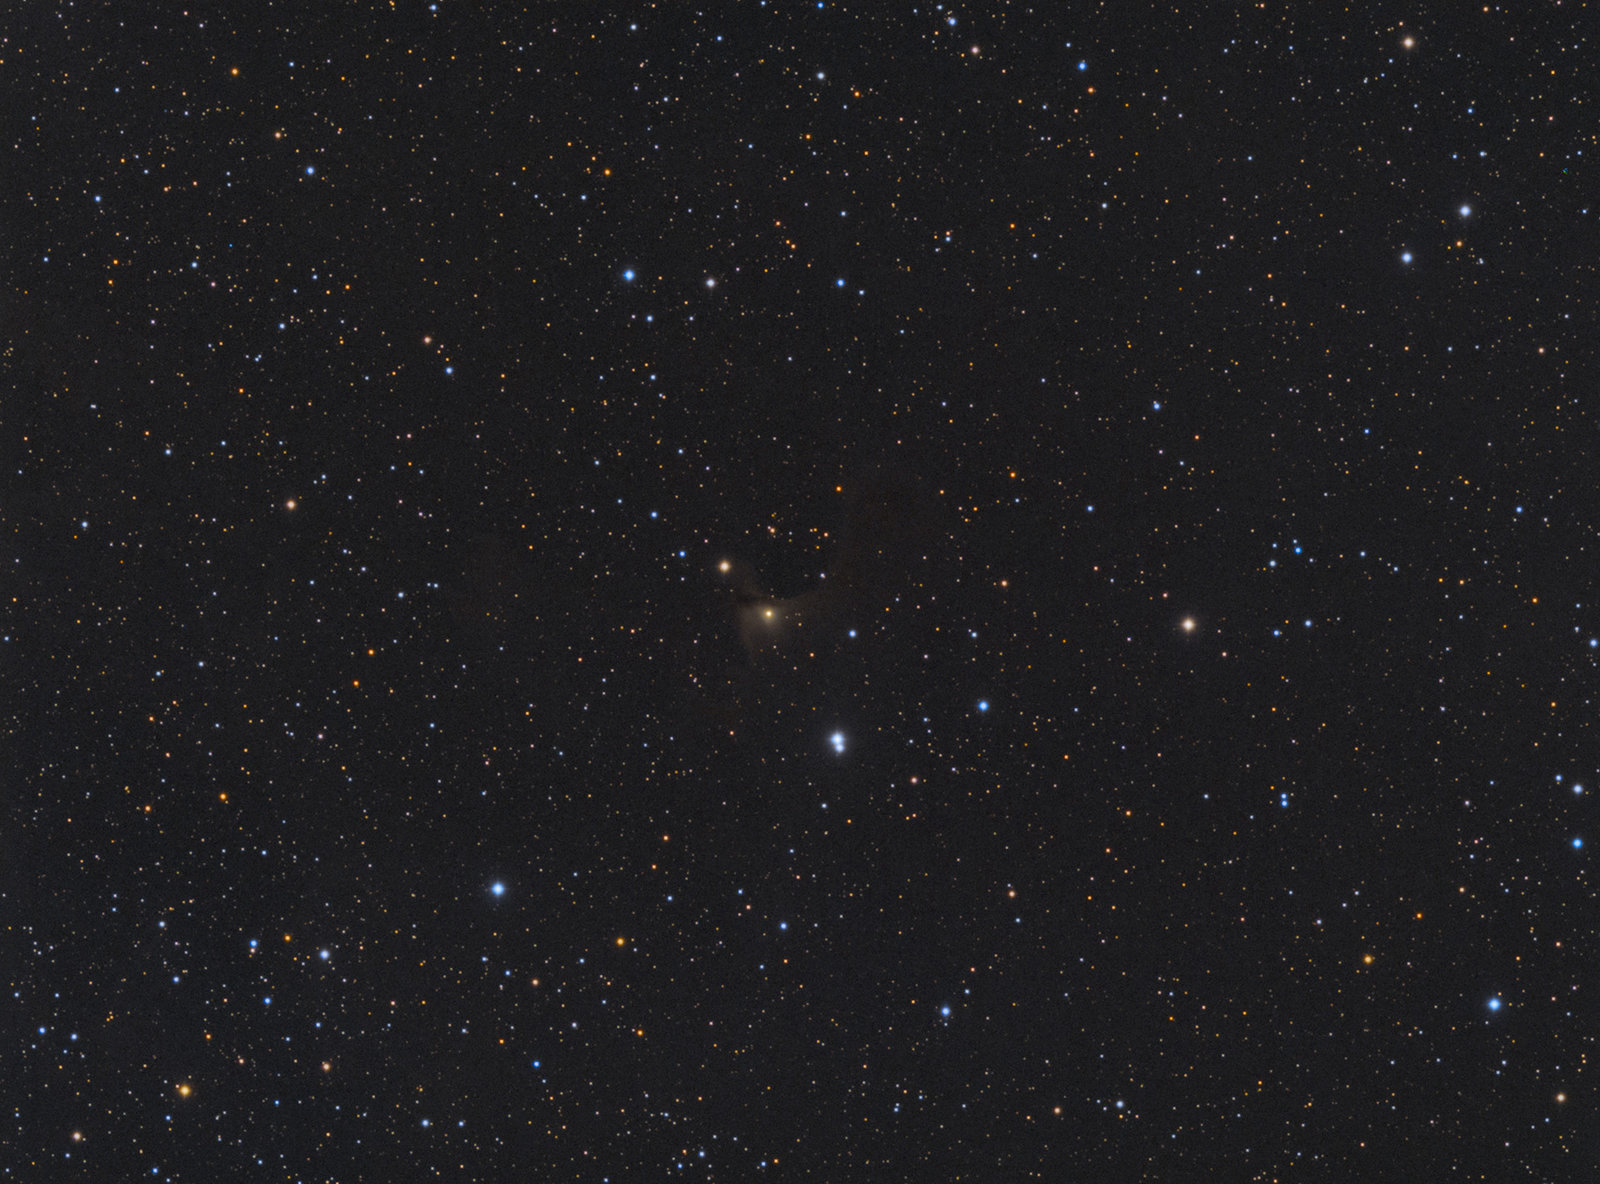 vdB141_RGB_SC_eXc_HT_cr_cb_ARG_col_stars_col_stars_bckgr_ALR_ALR_col_1.jpg